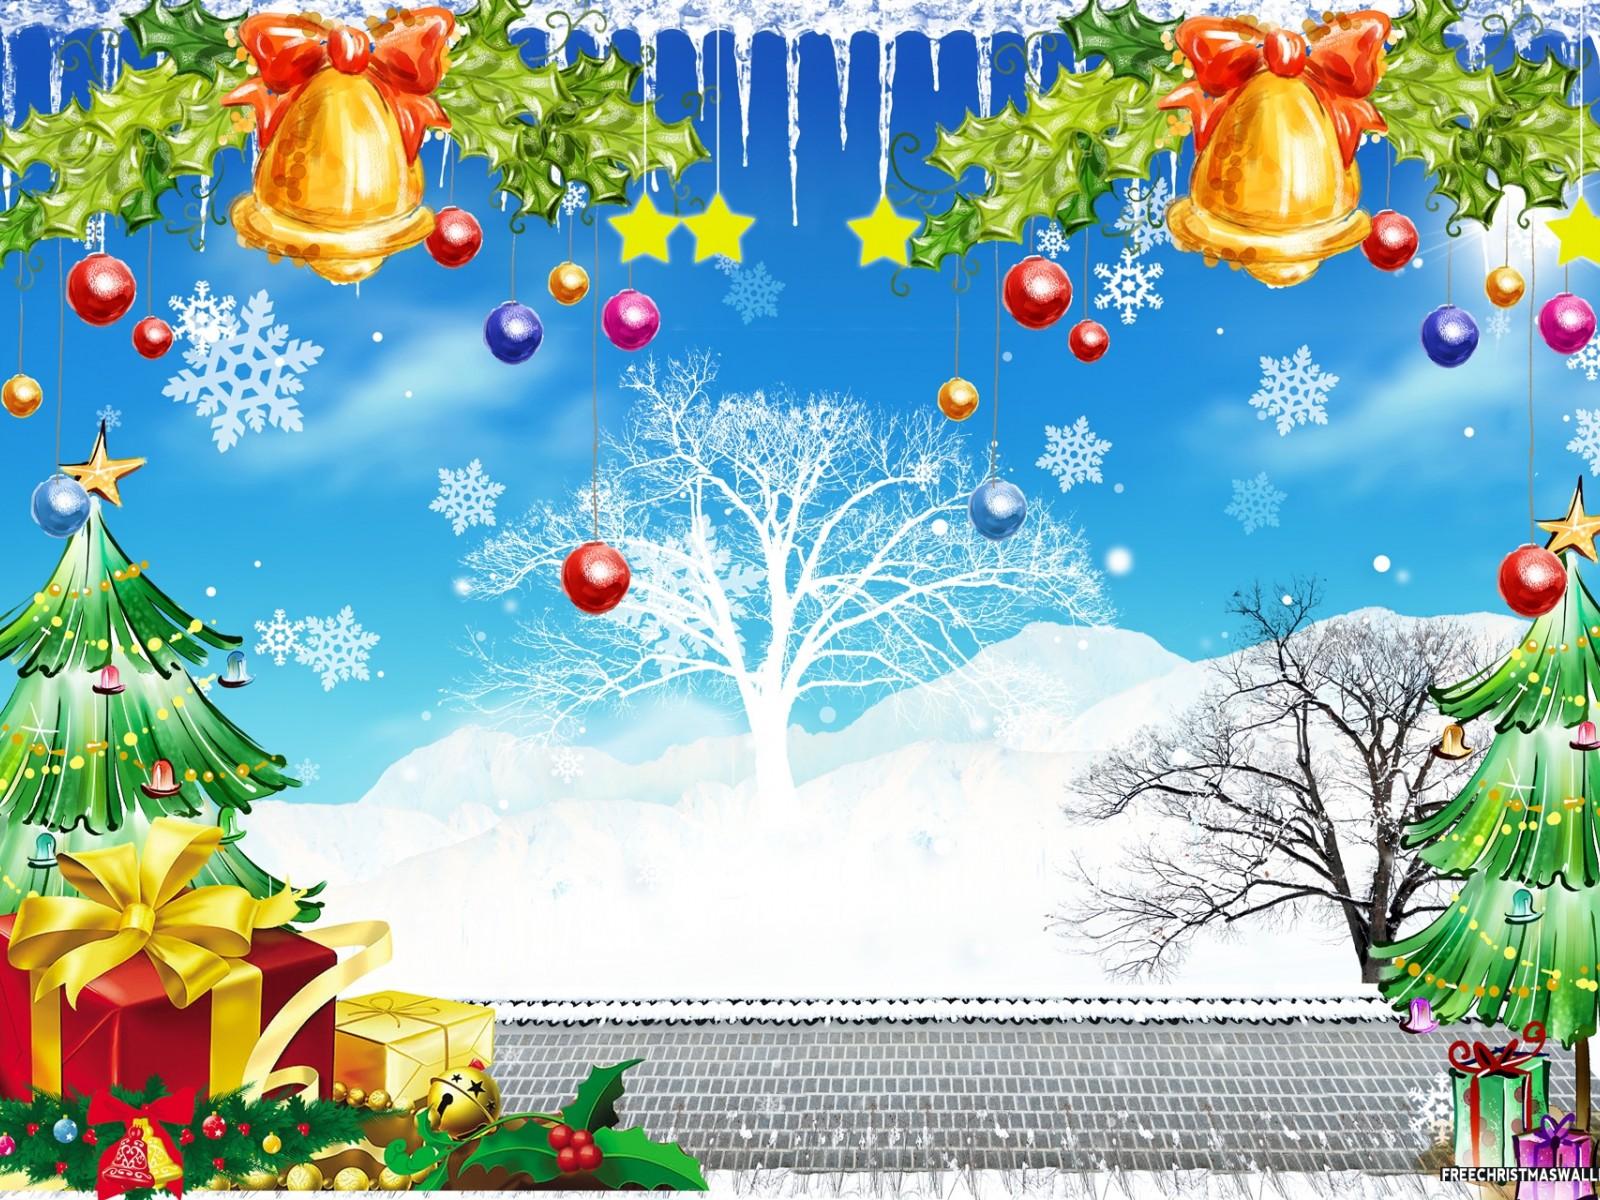 Christmas nature and gifts 1600x1200 wallpaper - Christmas nature wallpaper ...